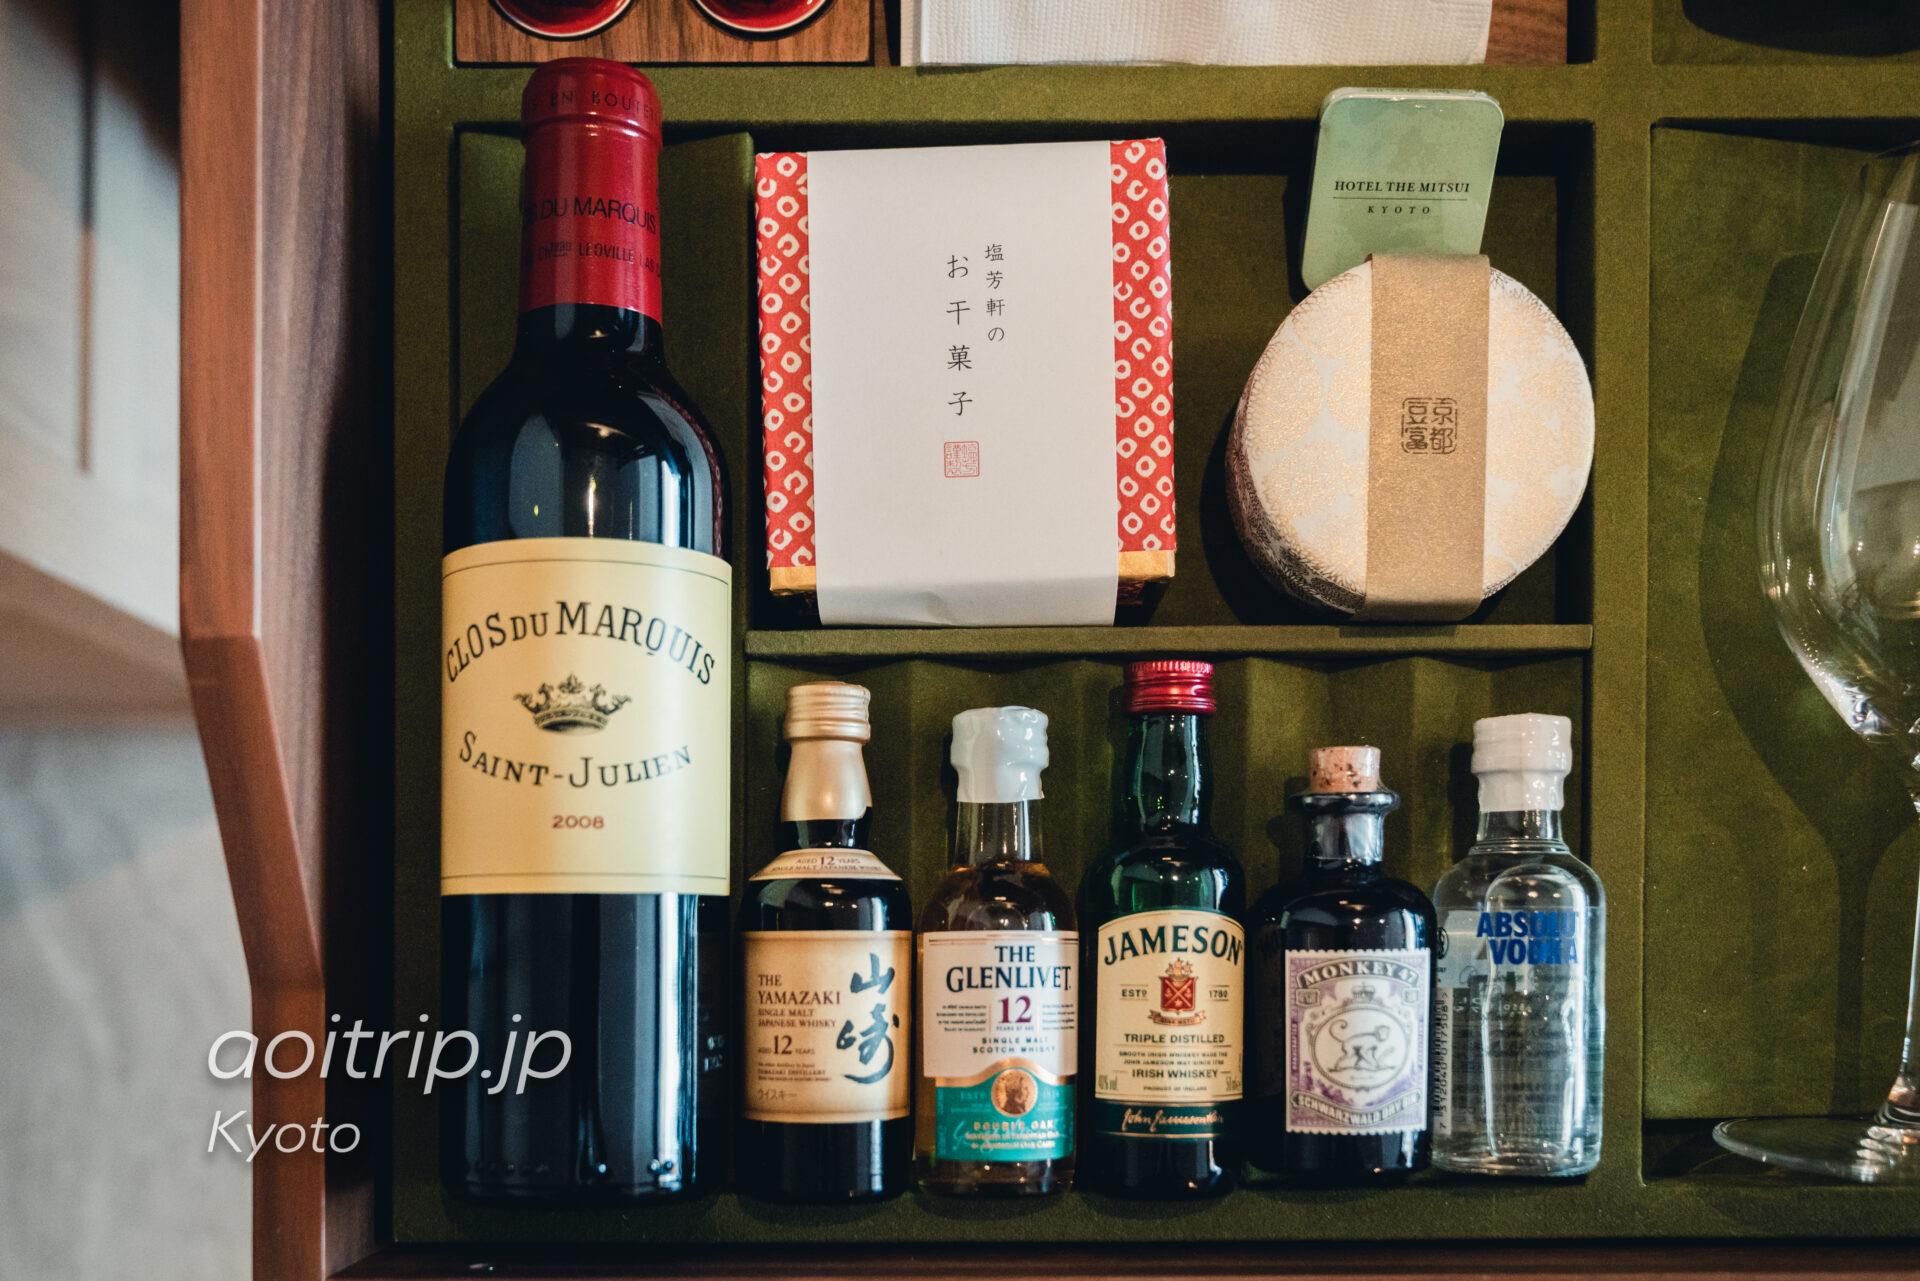 HOTEL THE MITSUI KYOTO デラックススイート ミニバー